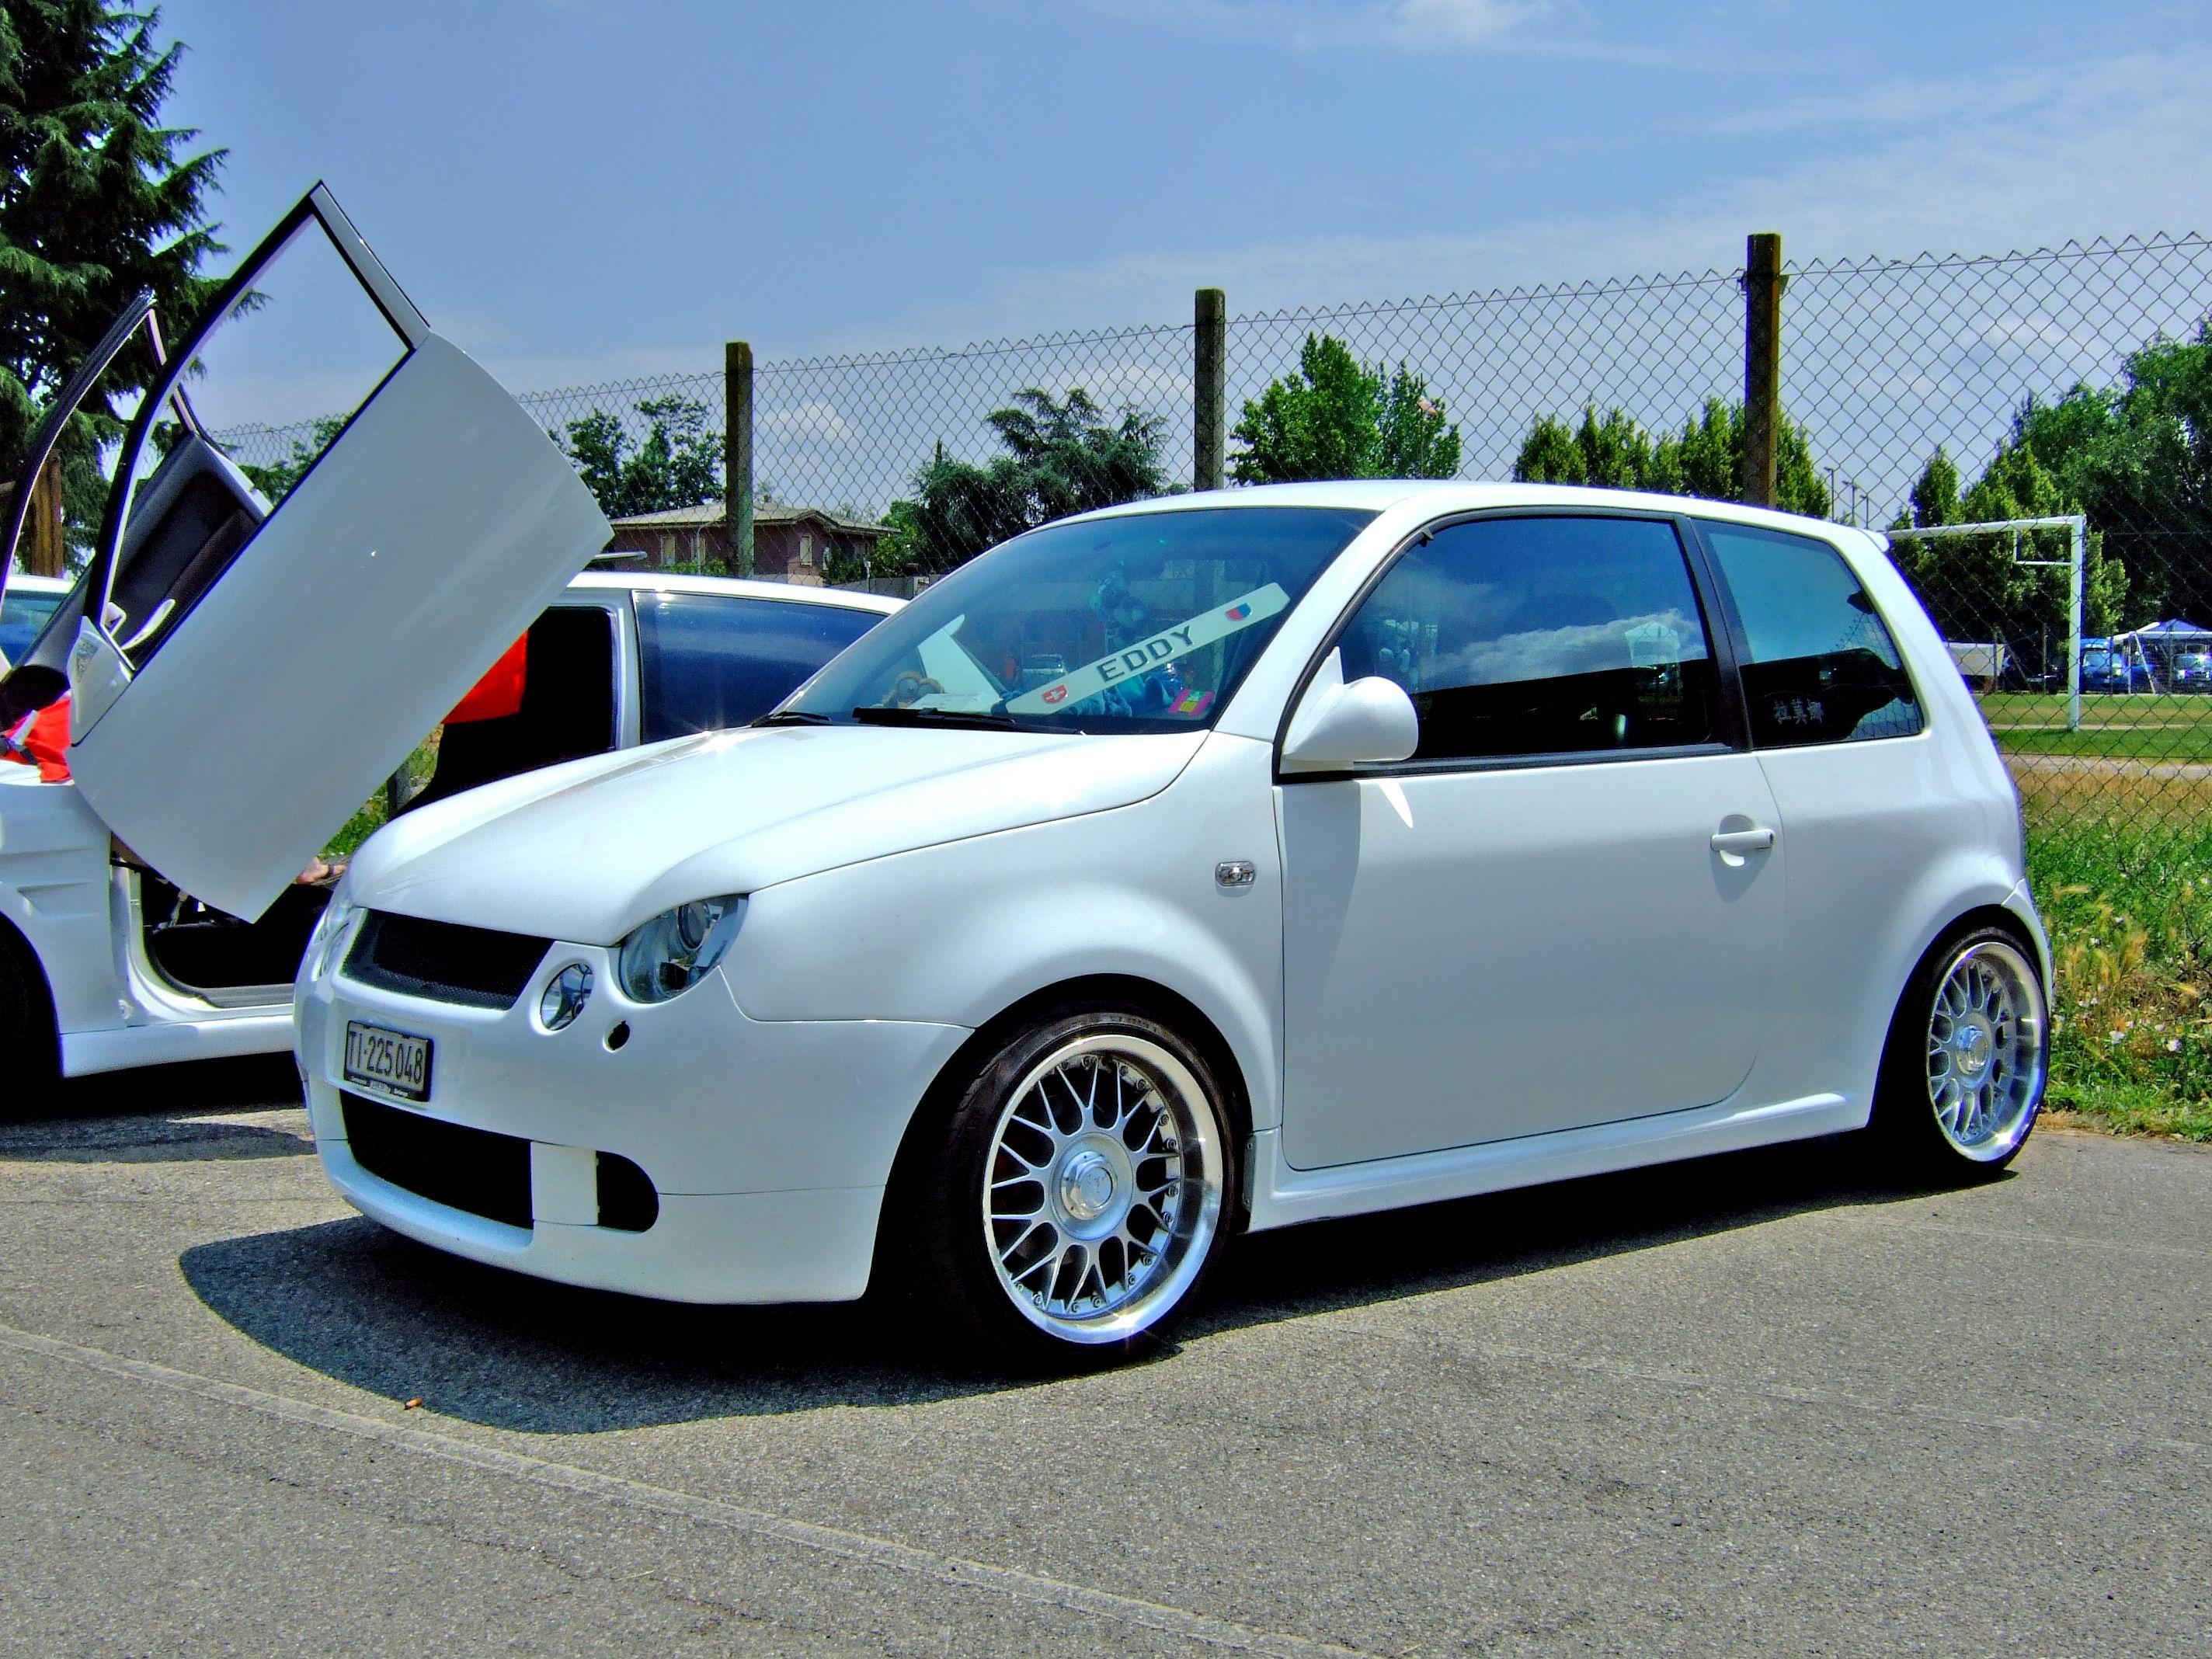 Worksheet. 66 best VW Lupo Love images on Pinterest  Volkswagen Motors and